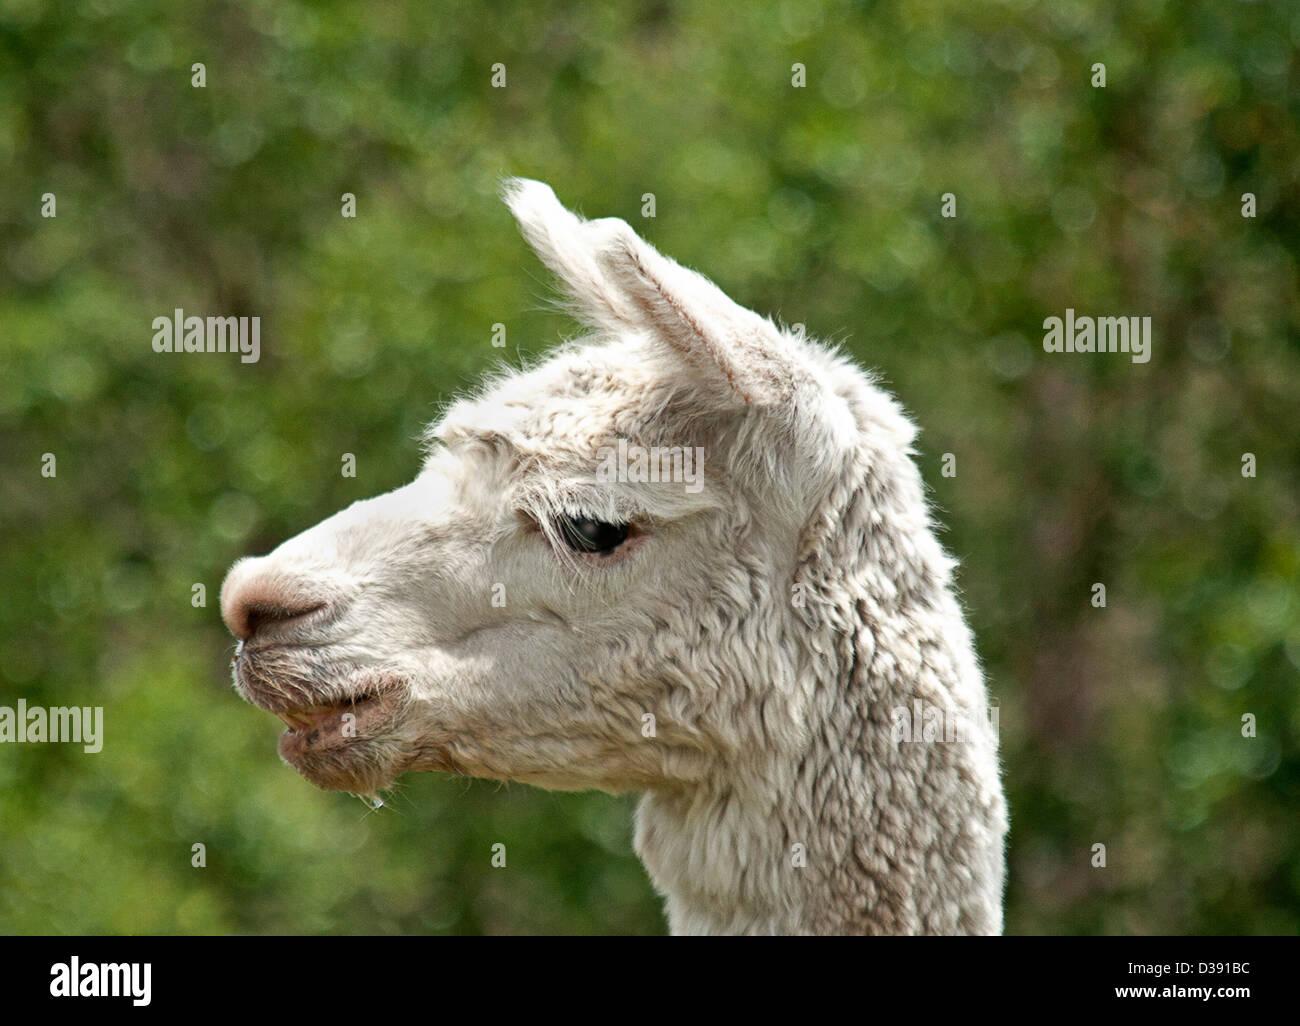 Face of white Suri alpaca against dark green background - Stock Image